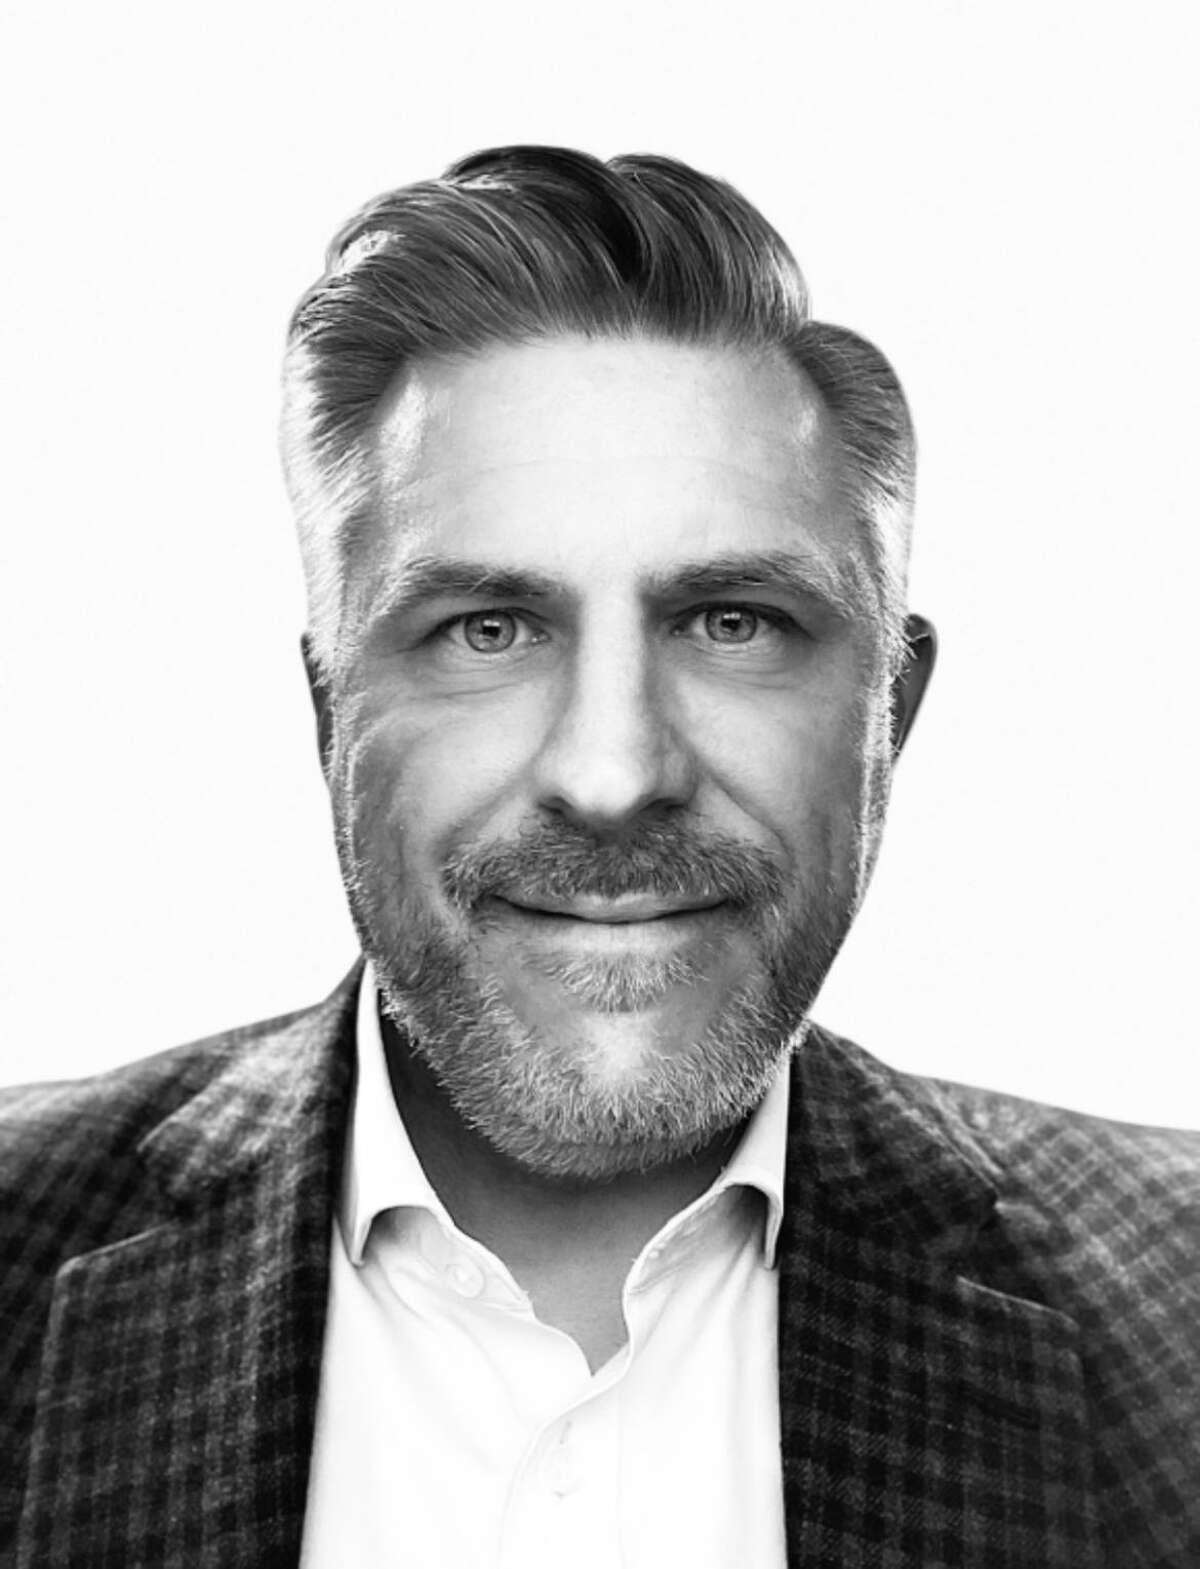 Schools Superintendent-Principal Jeff Melendez